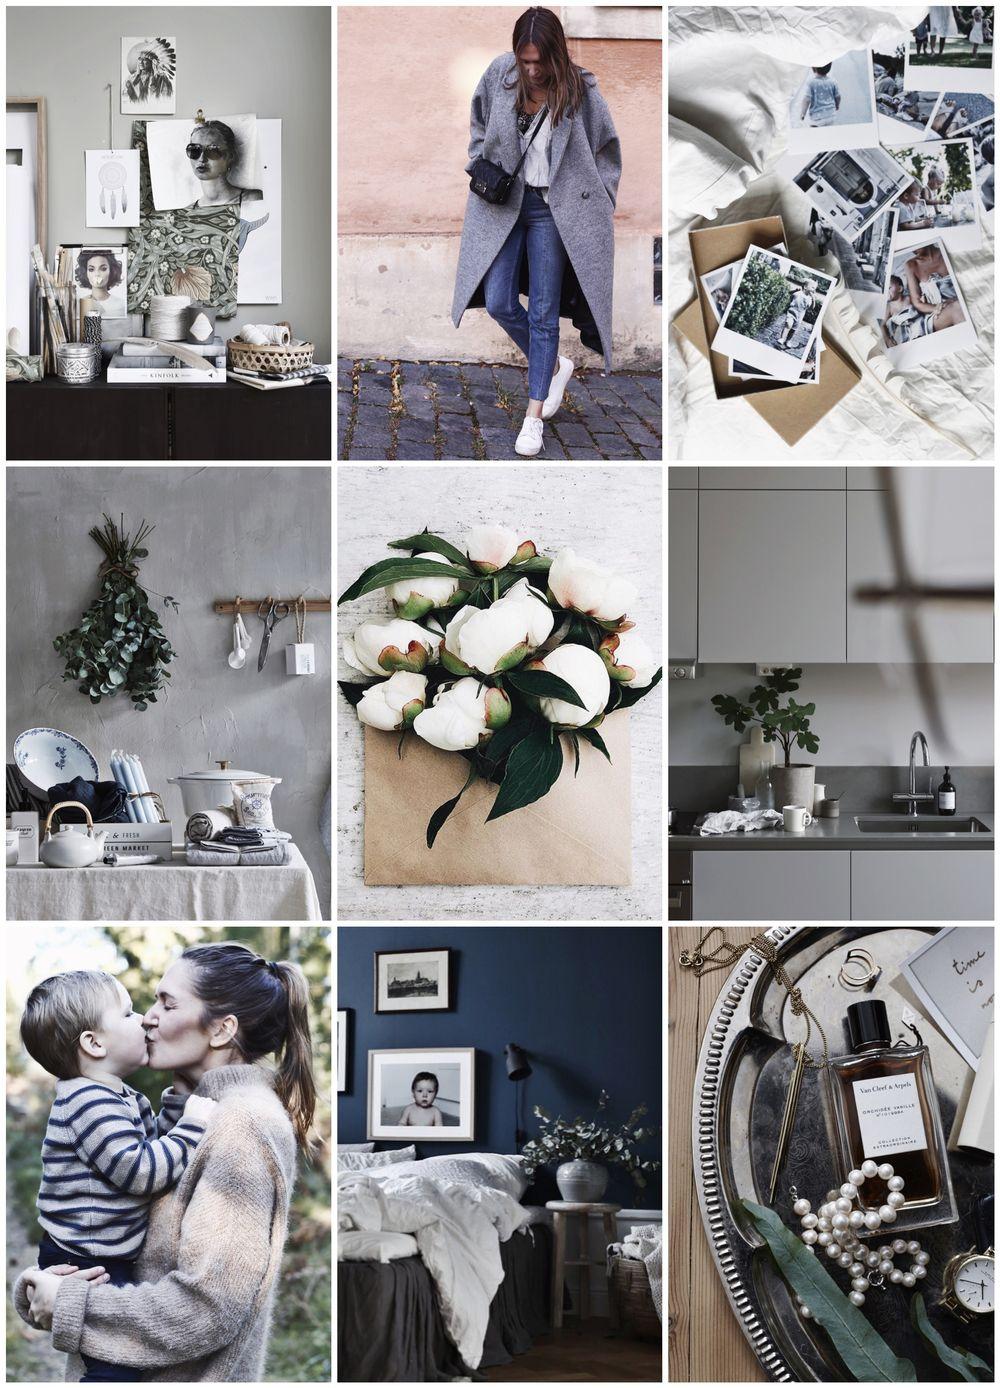 Blog love Jasmina Bylund – Husligheter